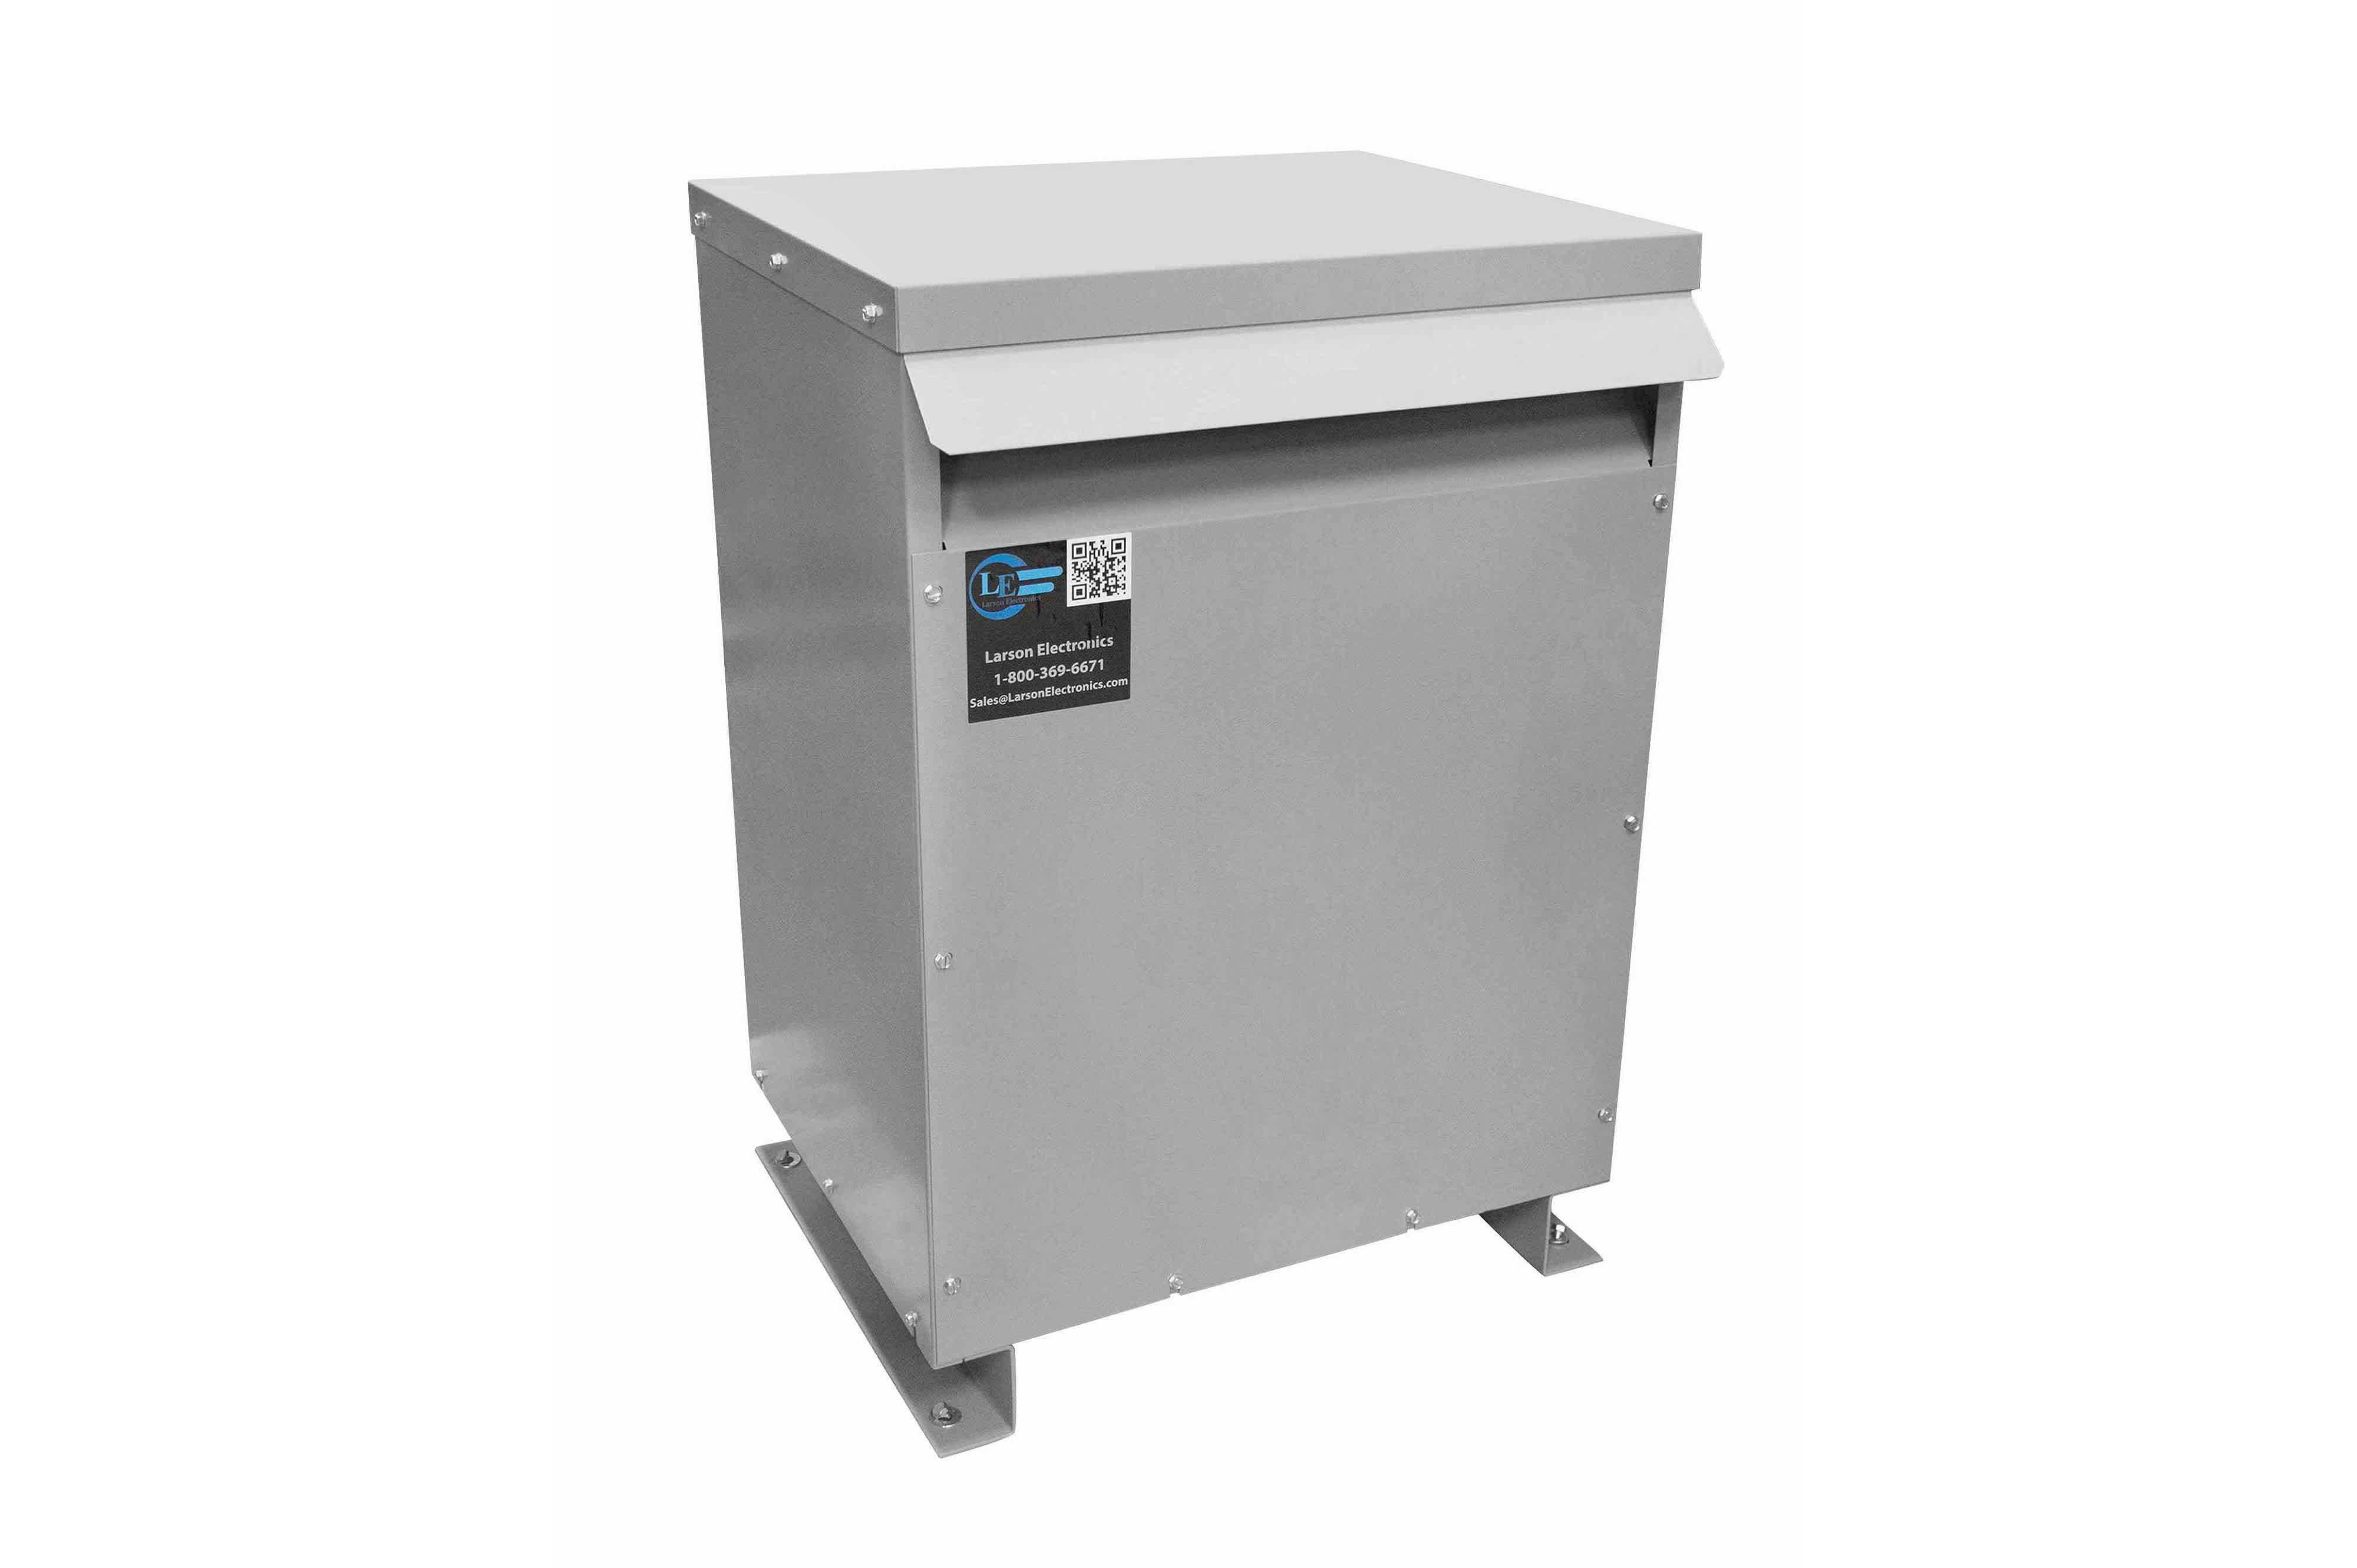 400 kVA 3PH Isolation Transformer, 380V Wye Primary, 600Y/347 Wye-N Secondary, N3R, Ventilated, 60 Hz